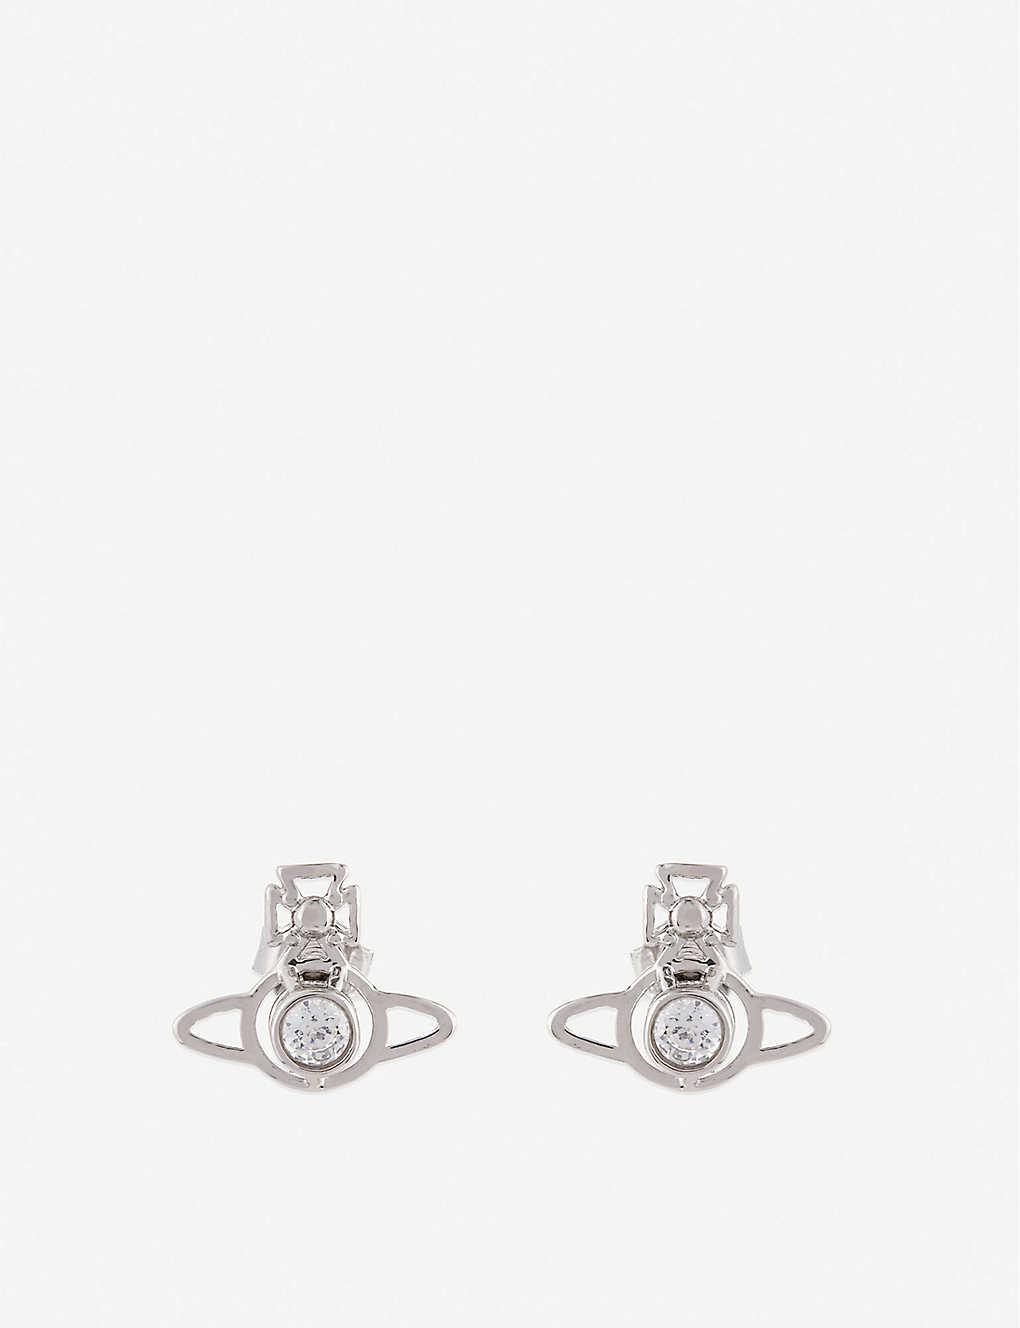 1c52bc3fa VIVIENNE WESTWOOD JEWELLERY - Nora orb earrings   Selfridges.com